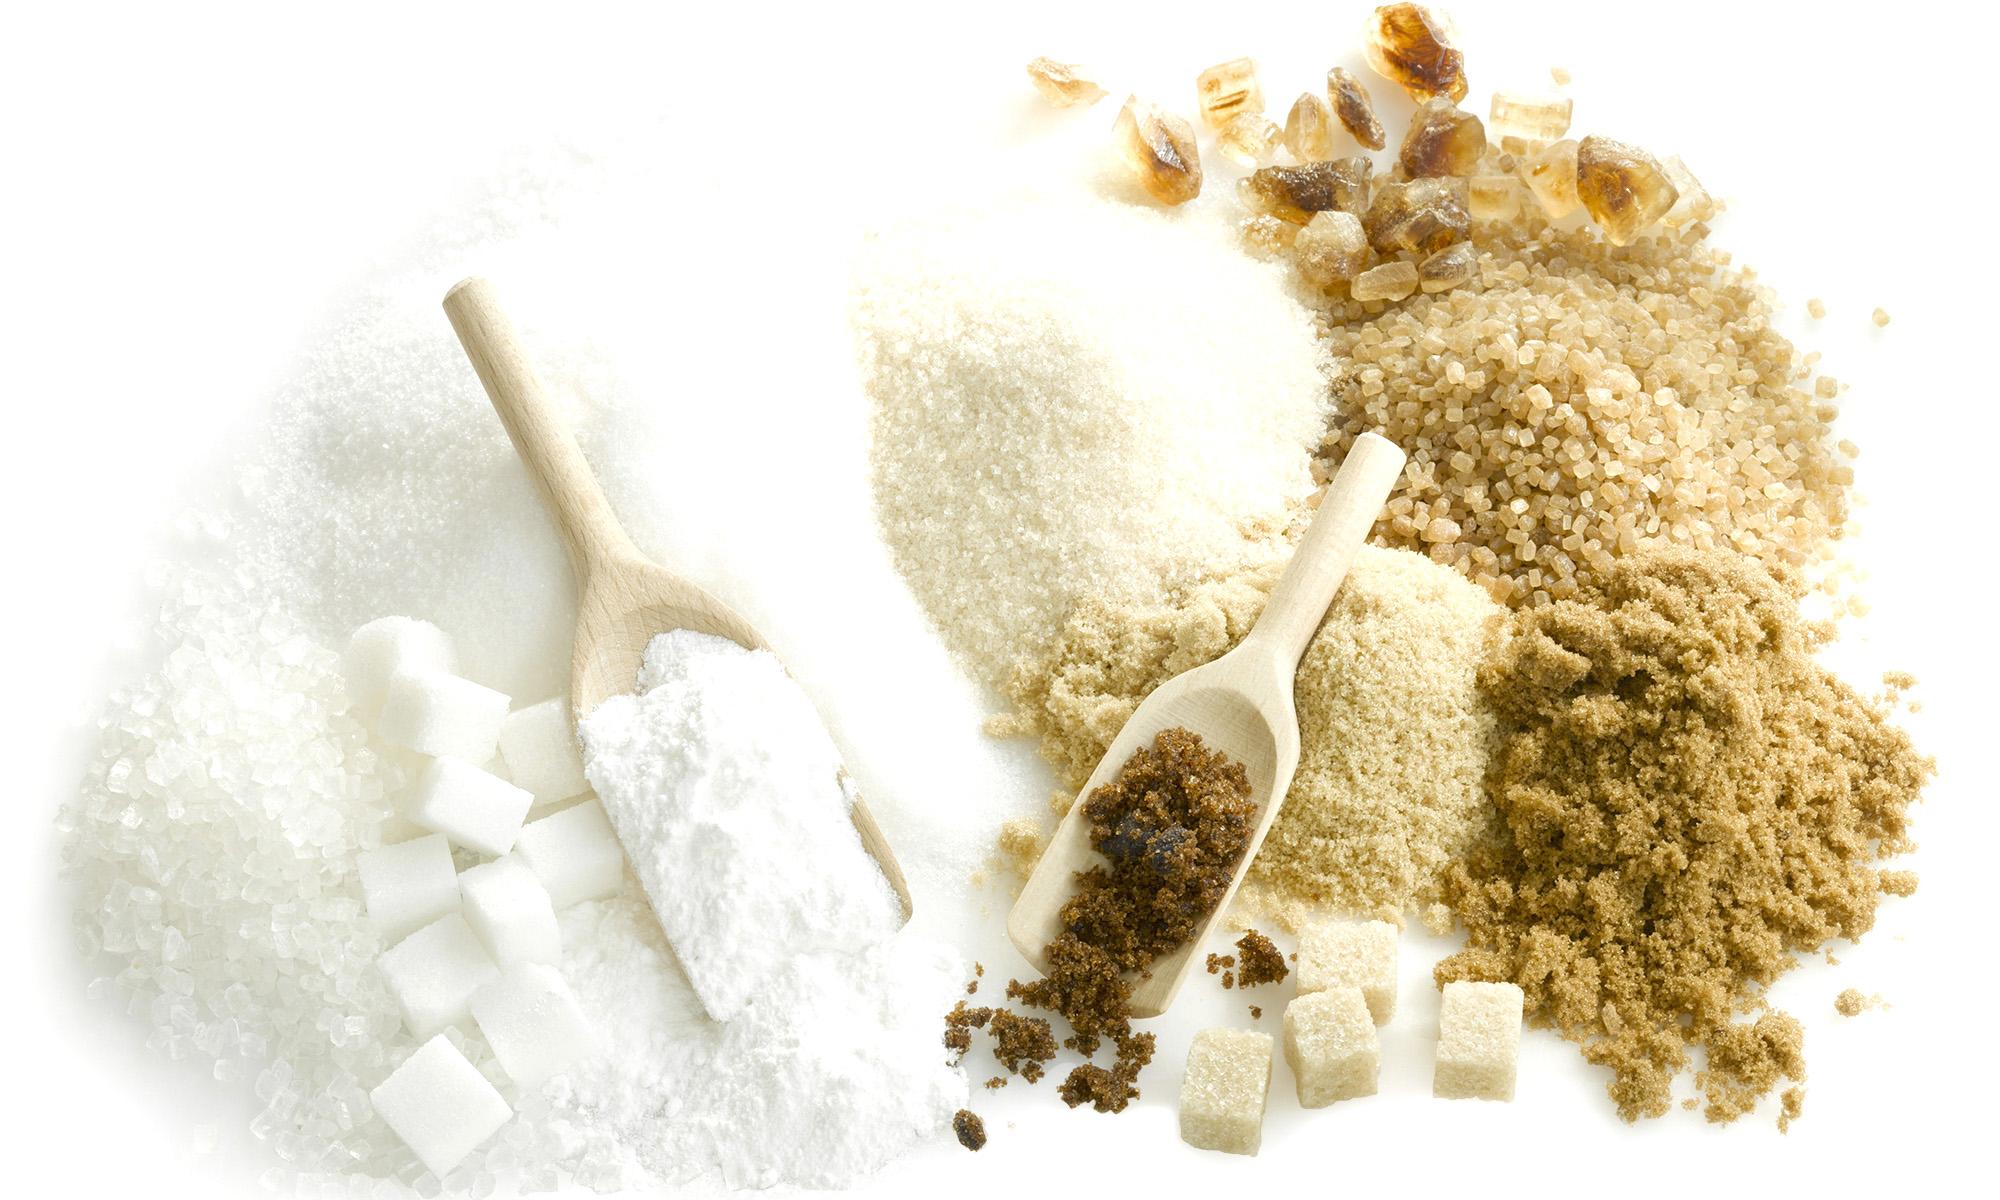 adoçante e açúcar